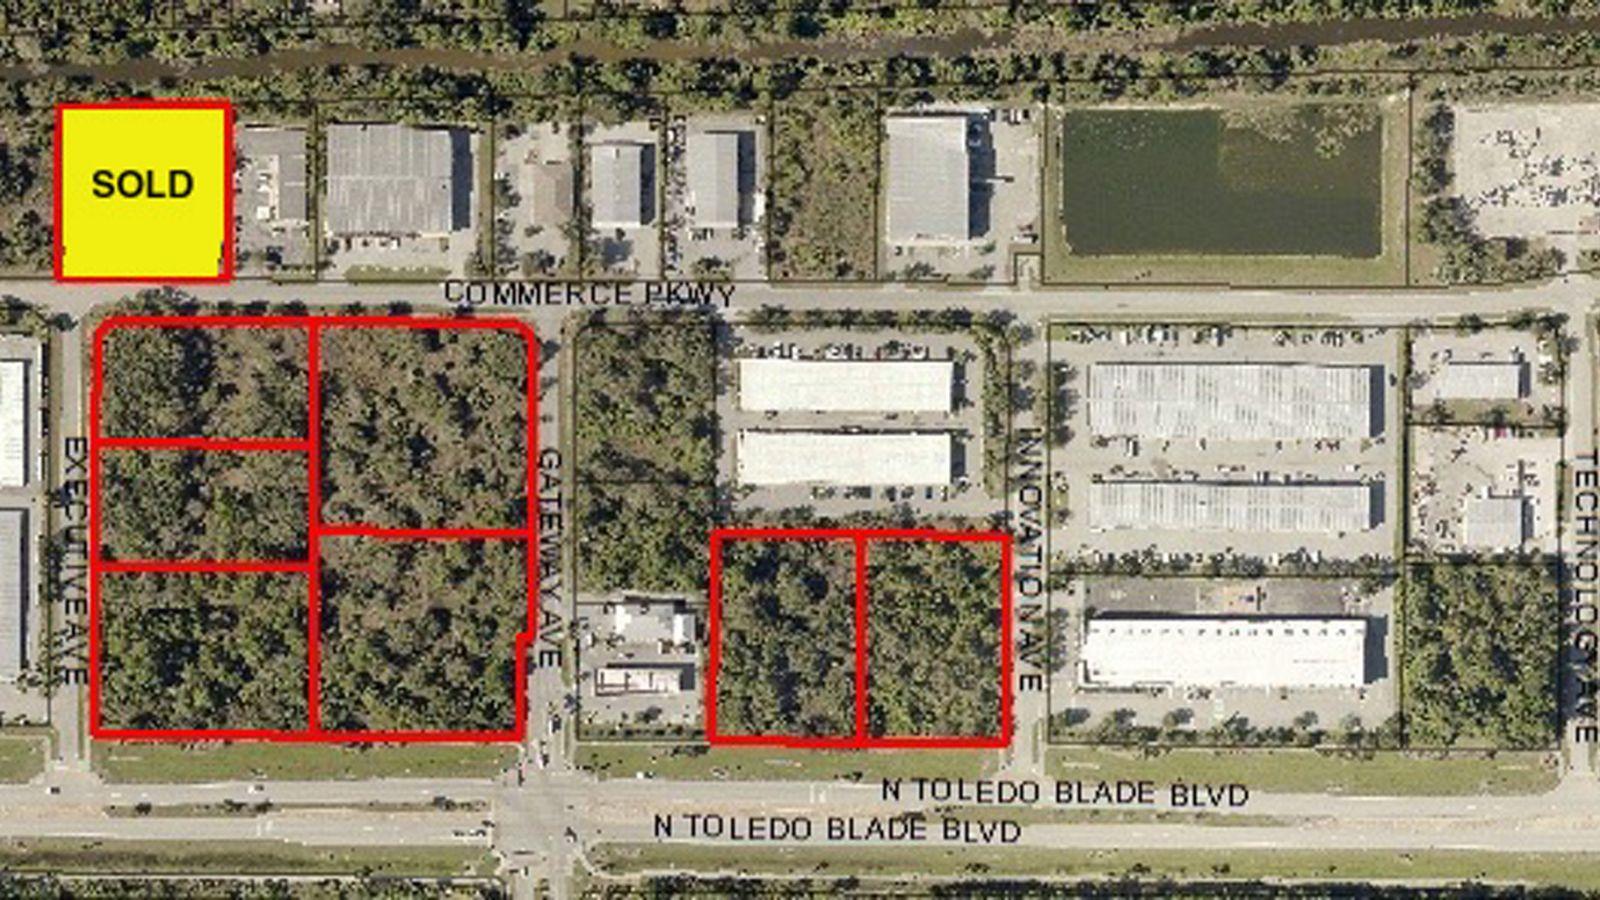 North Port Development Opportunity Harshmanrealestatecom - Florida map north port